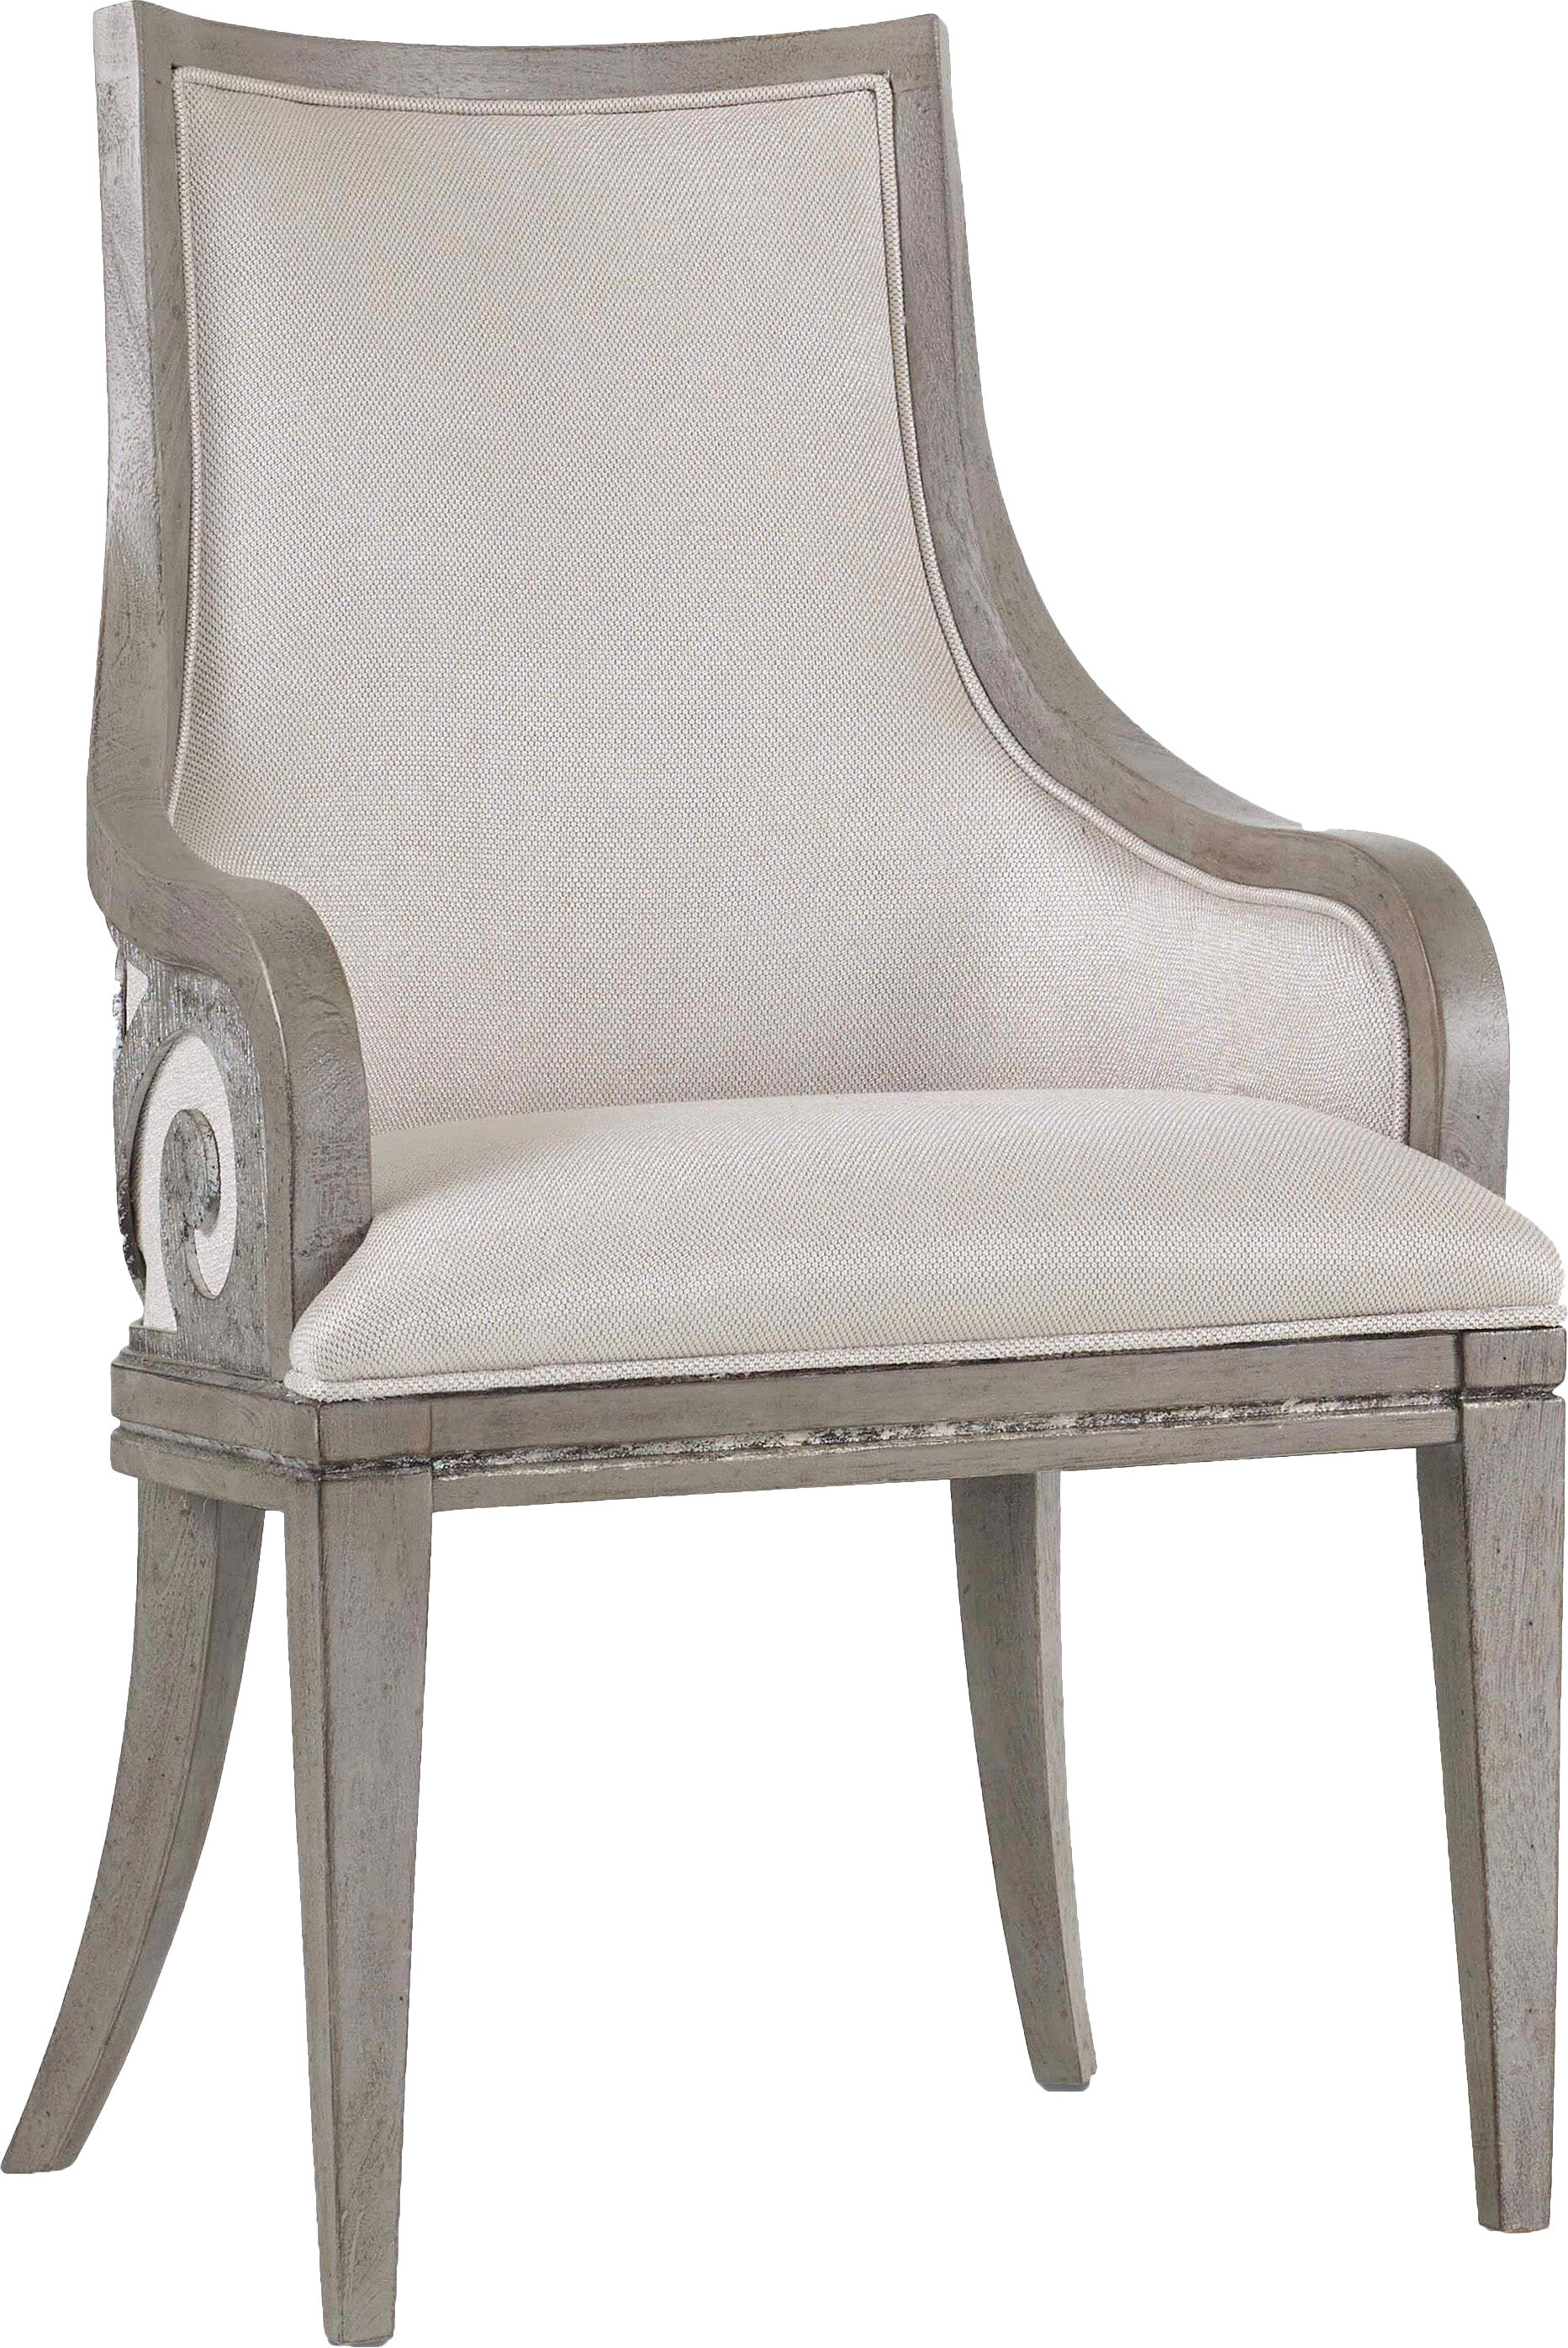 Hooker Furniture Sanctuary Upholstered Dining Arm Chair Wayfair